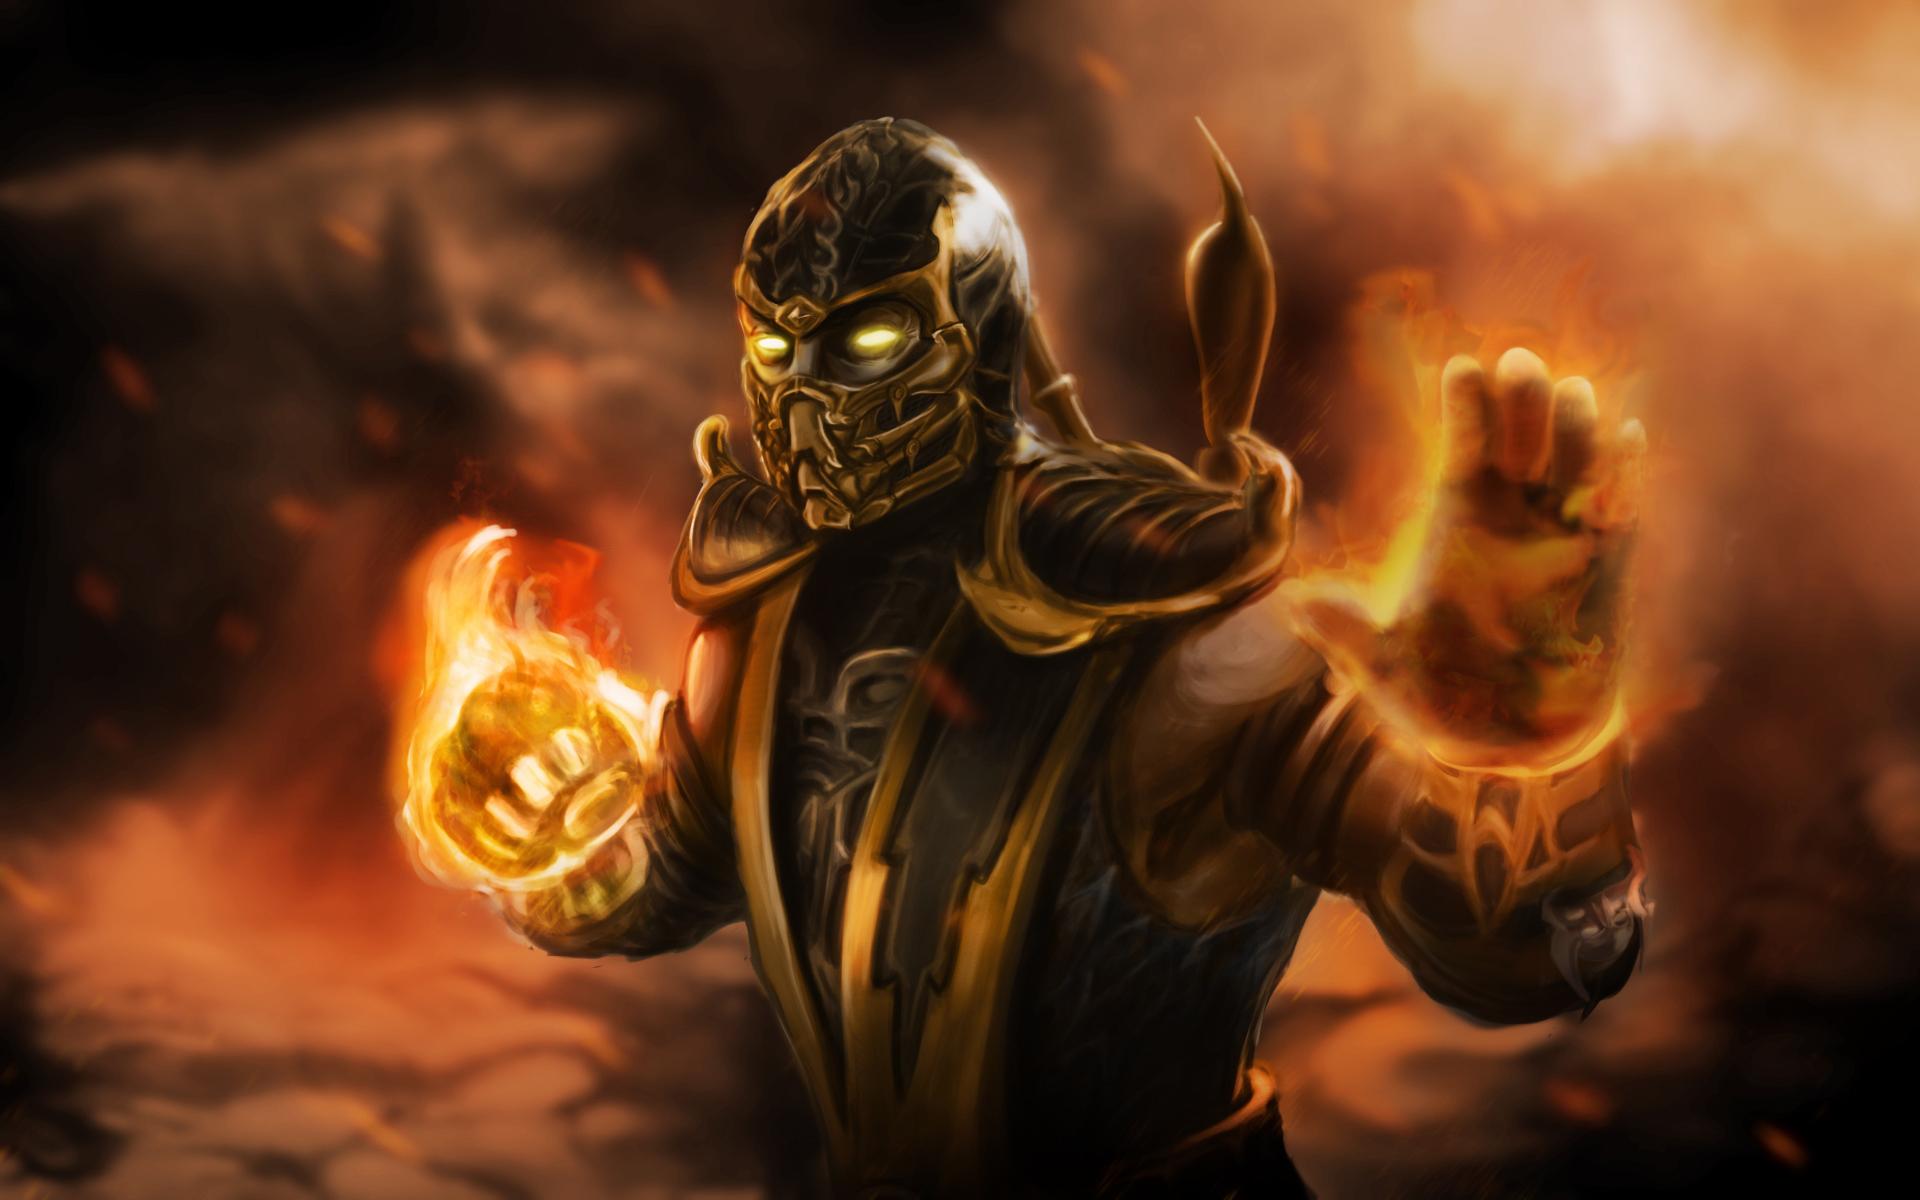 Scorpion Mortal Kombat Wallpaper